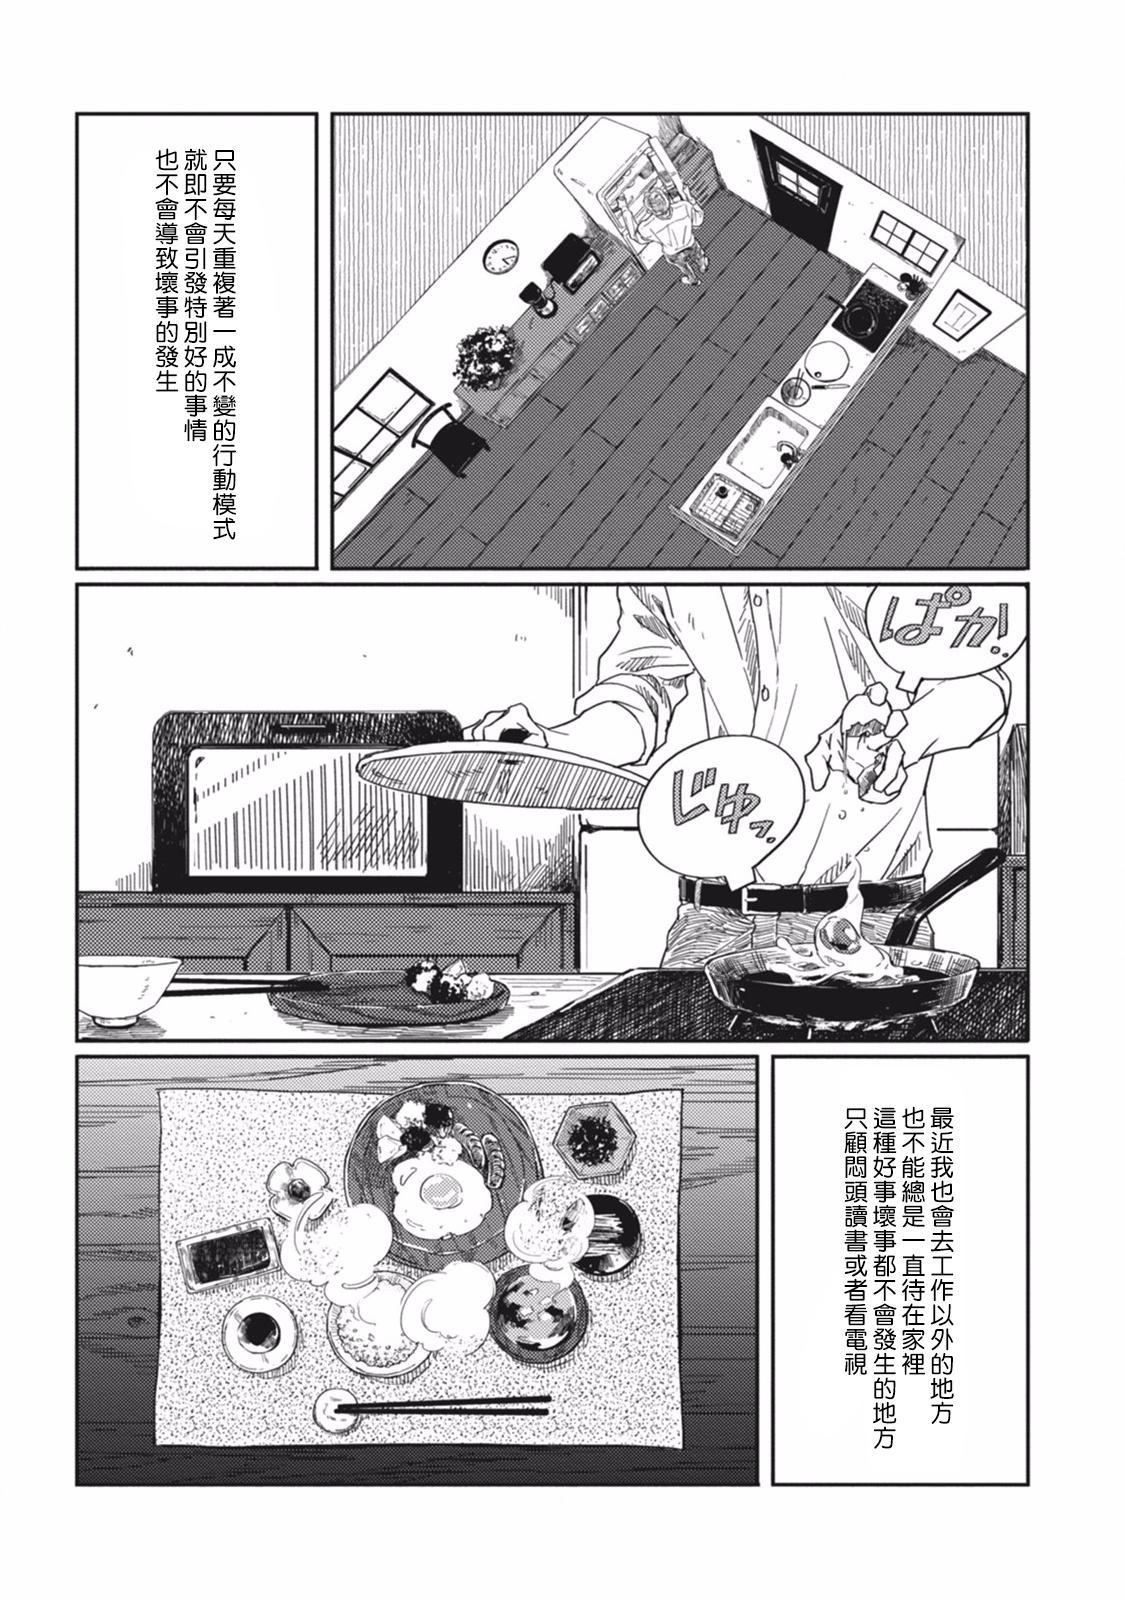 [Sagan Sagan] Old-fashioned Cupcake Ch. 1-2 [Chinese] [拾荒者汉化组] [Digital] 4